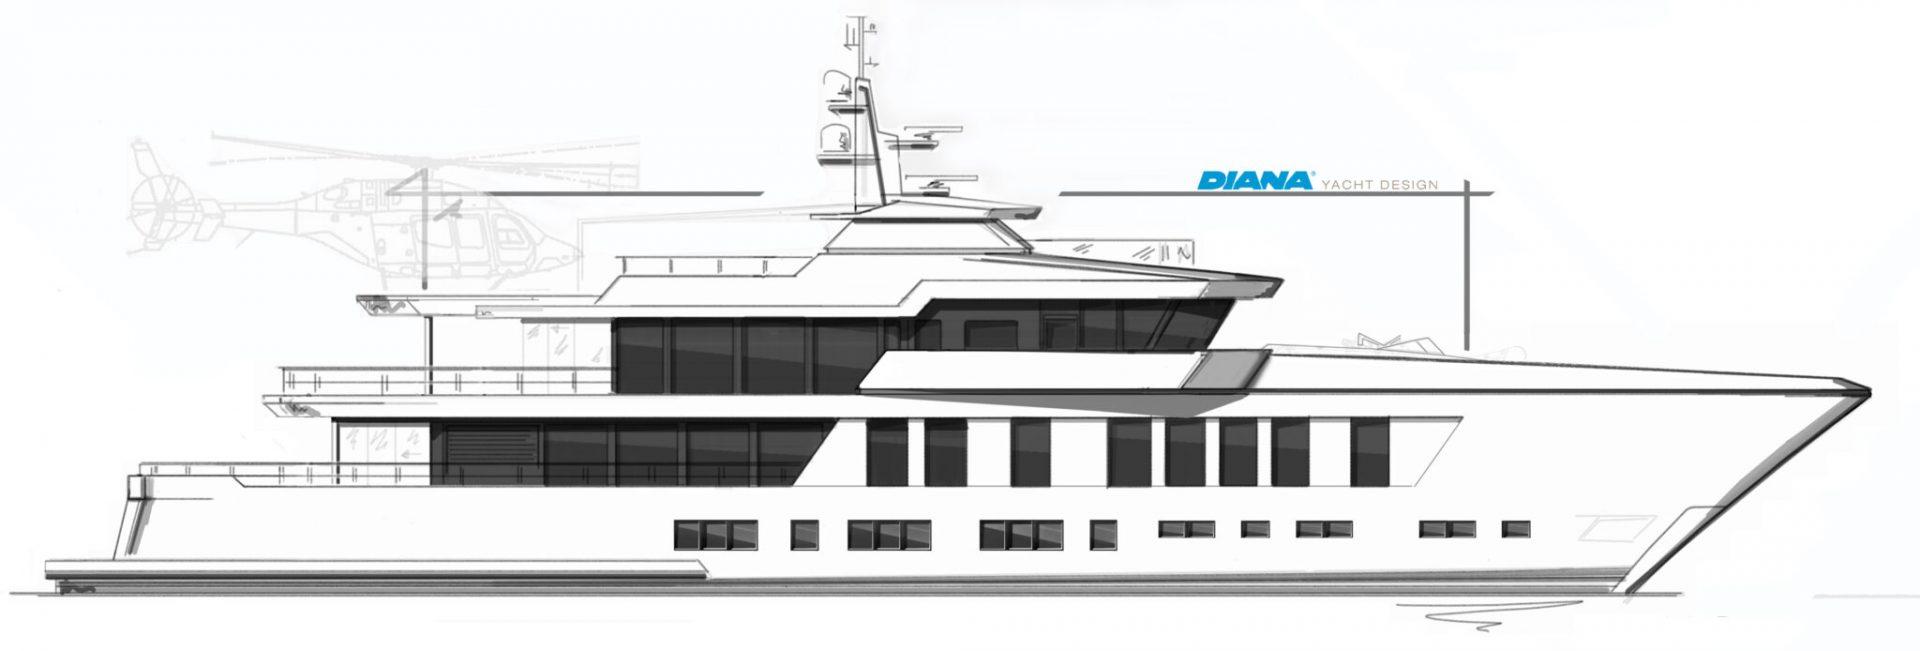 DIANA R.50 profile sketch concept design yacht